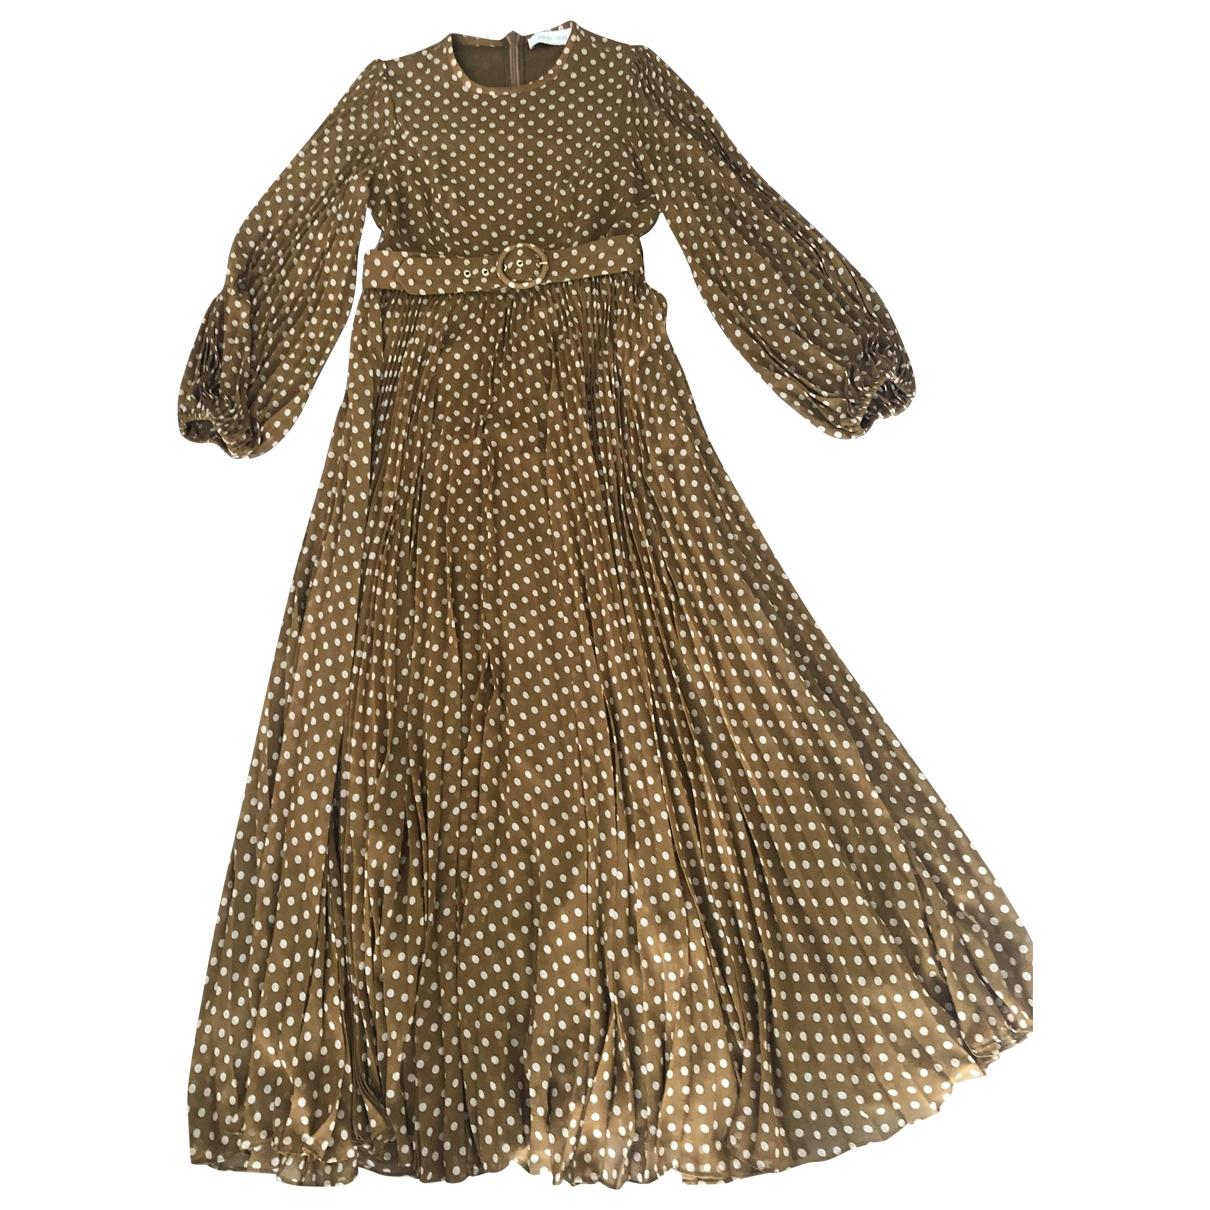 Zimmermann \N Kleid in  Beige Polyester